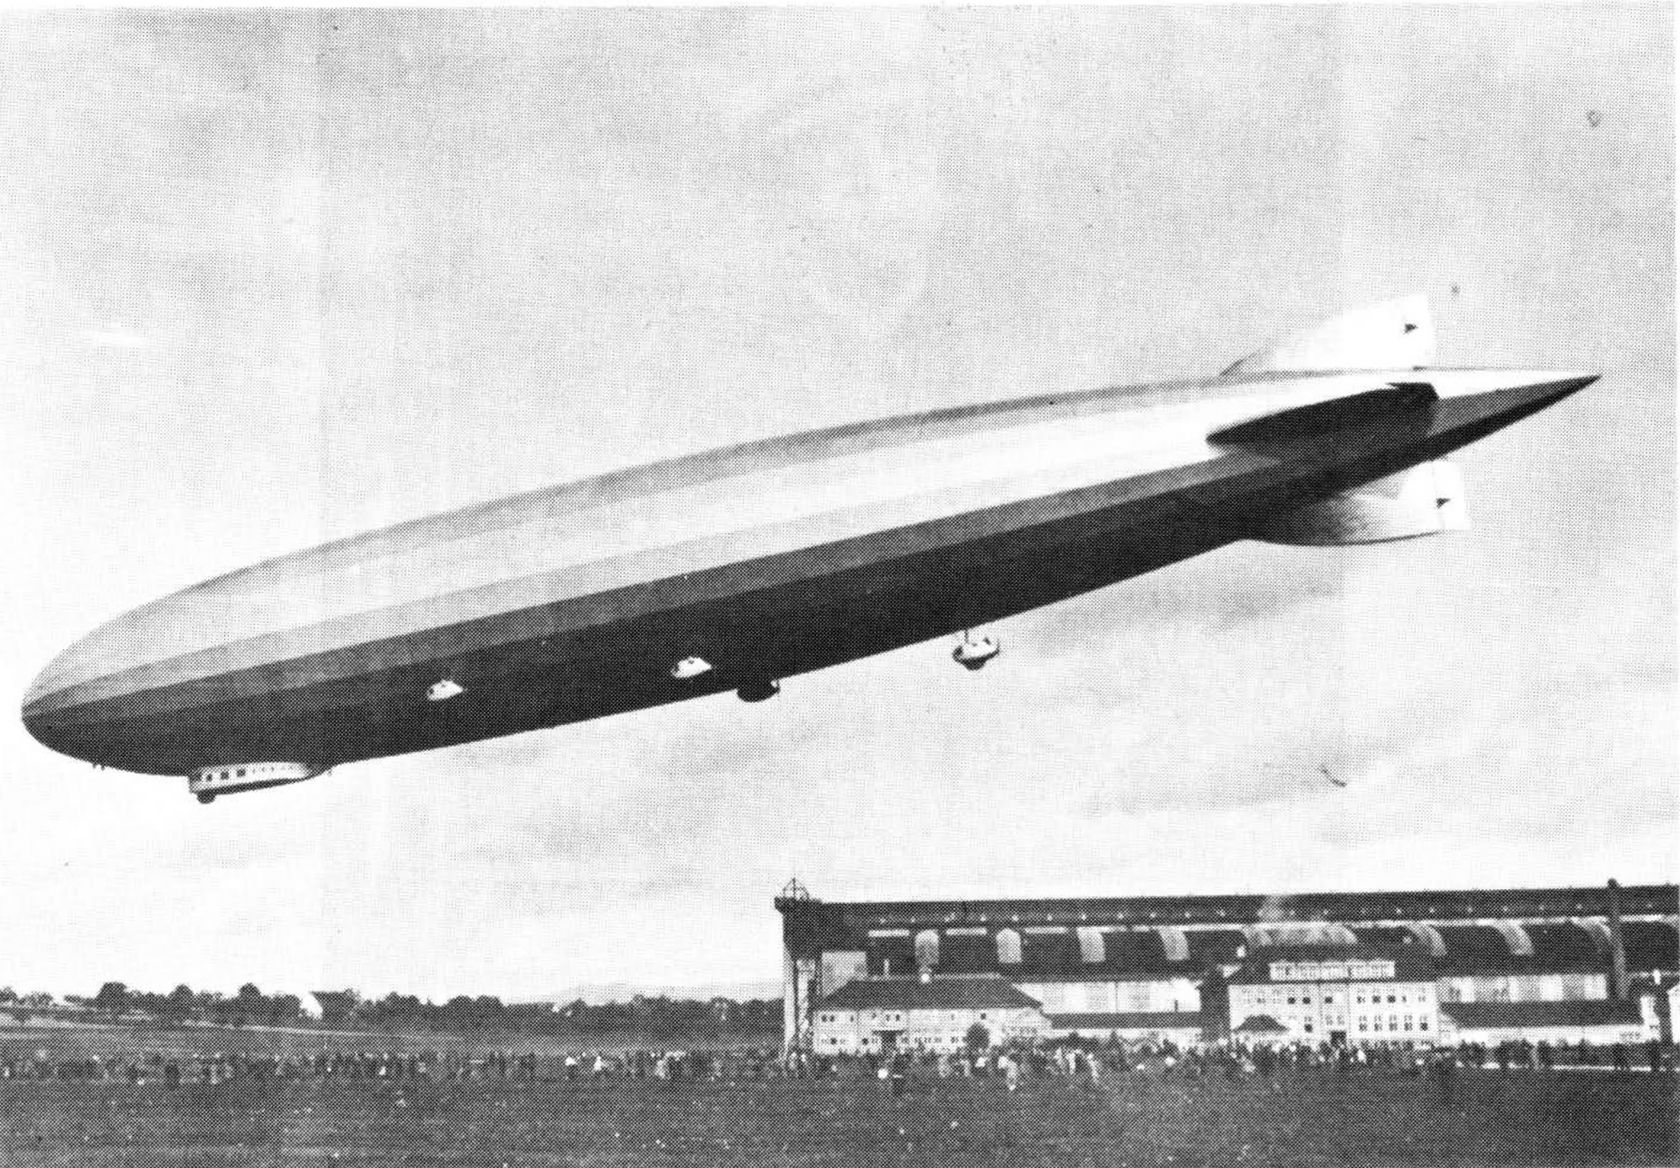 Zeppelin_LZ_126-01-01